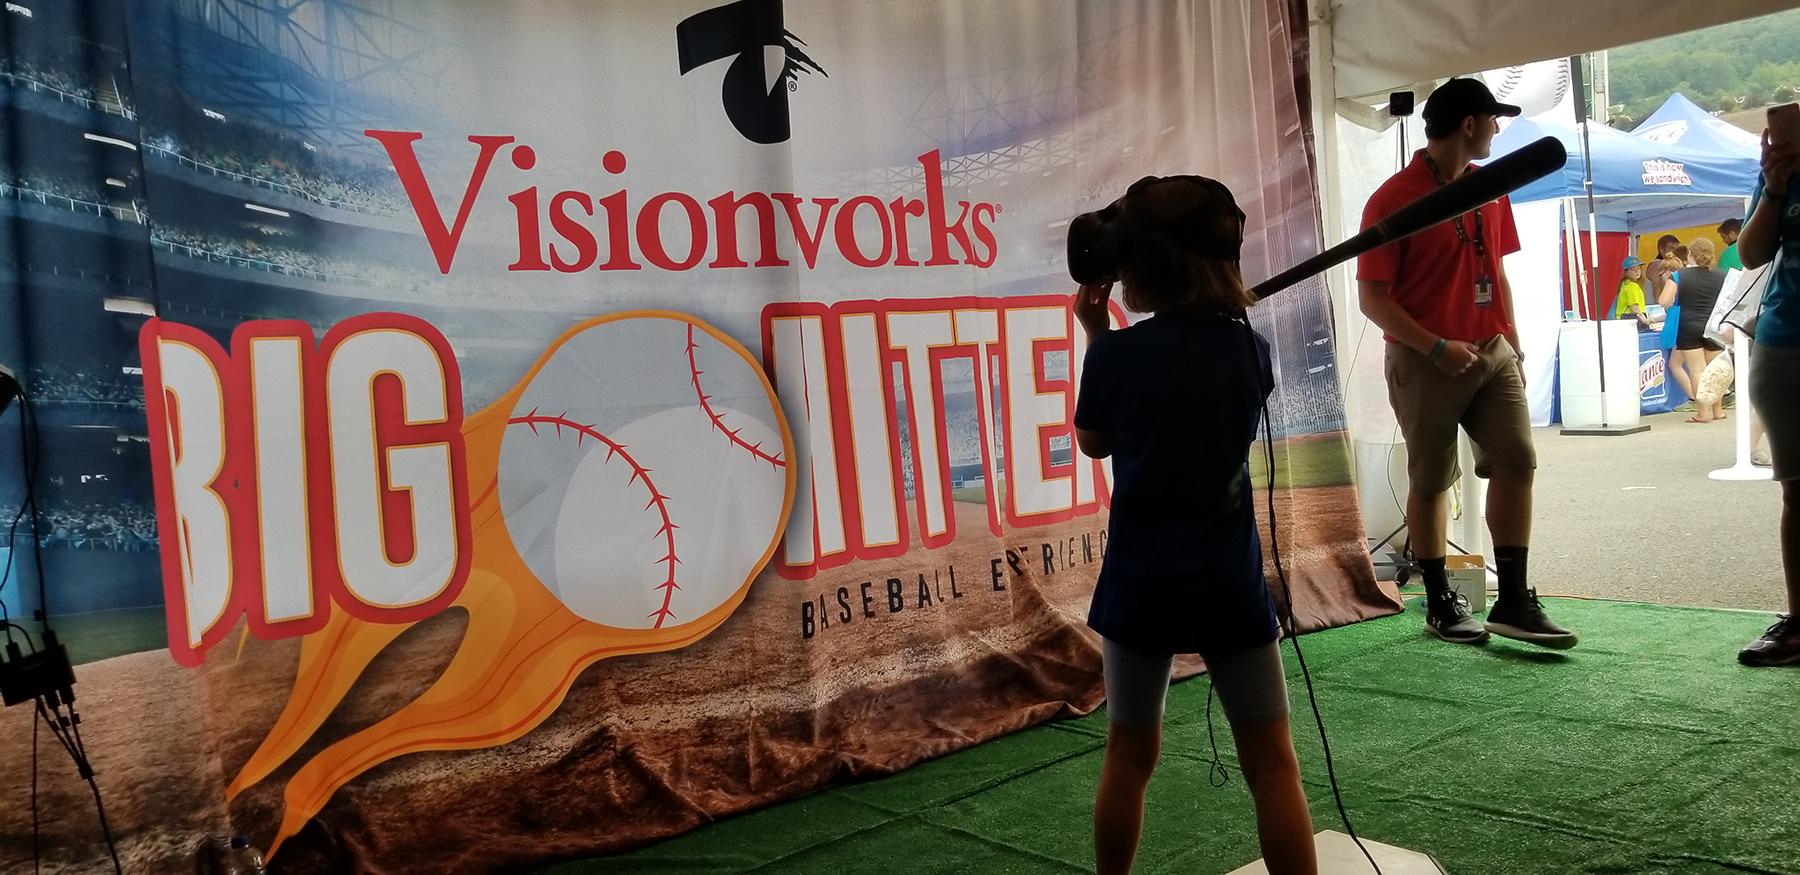 Visionworks, Little League World Series 2018 Sponsorship